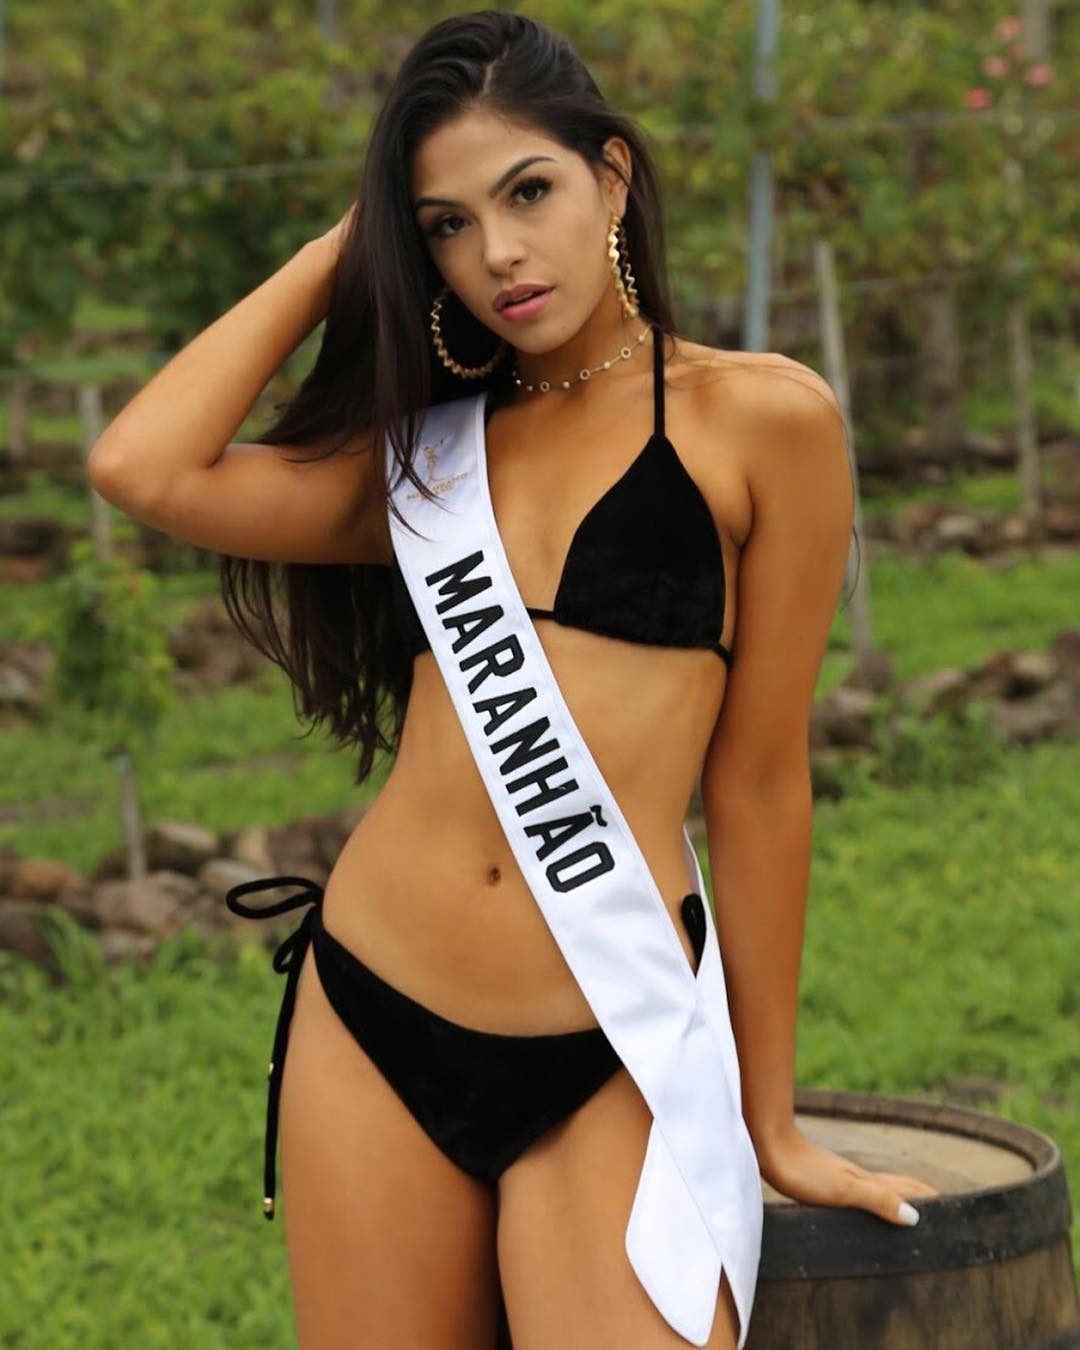 sao paulo vence miss grand brasil 2019. - Página 3 Iilvajwr